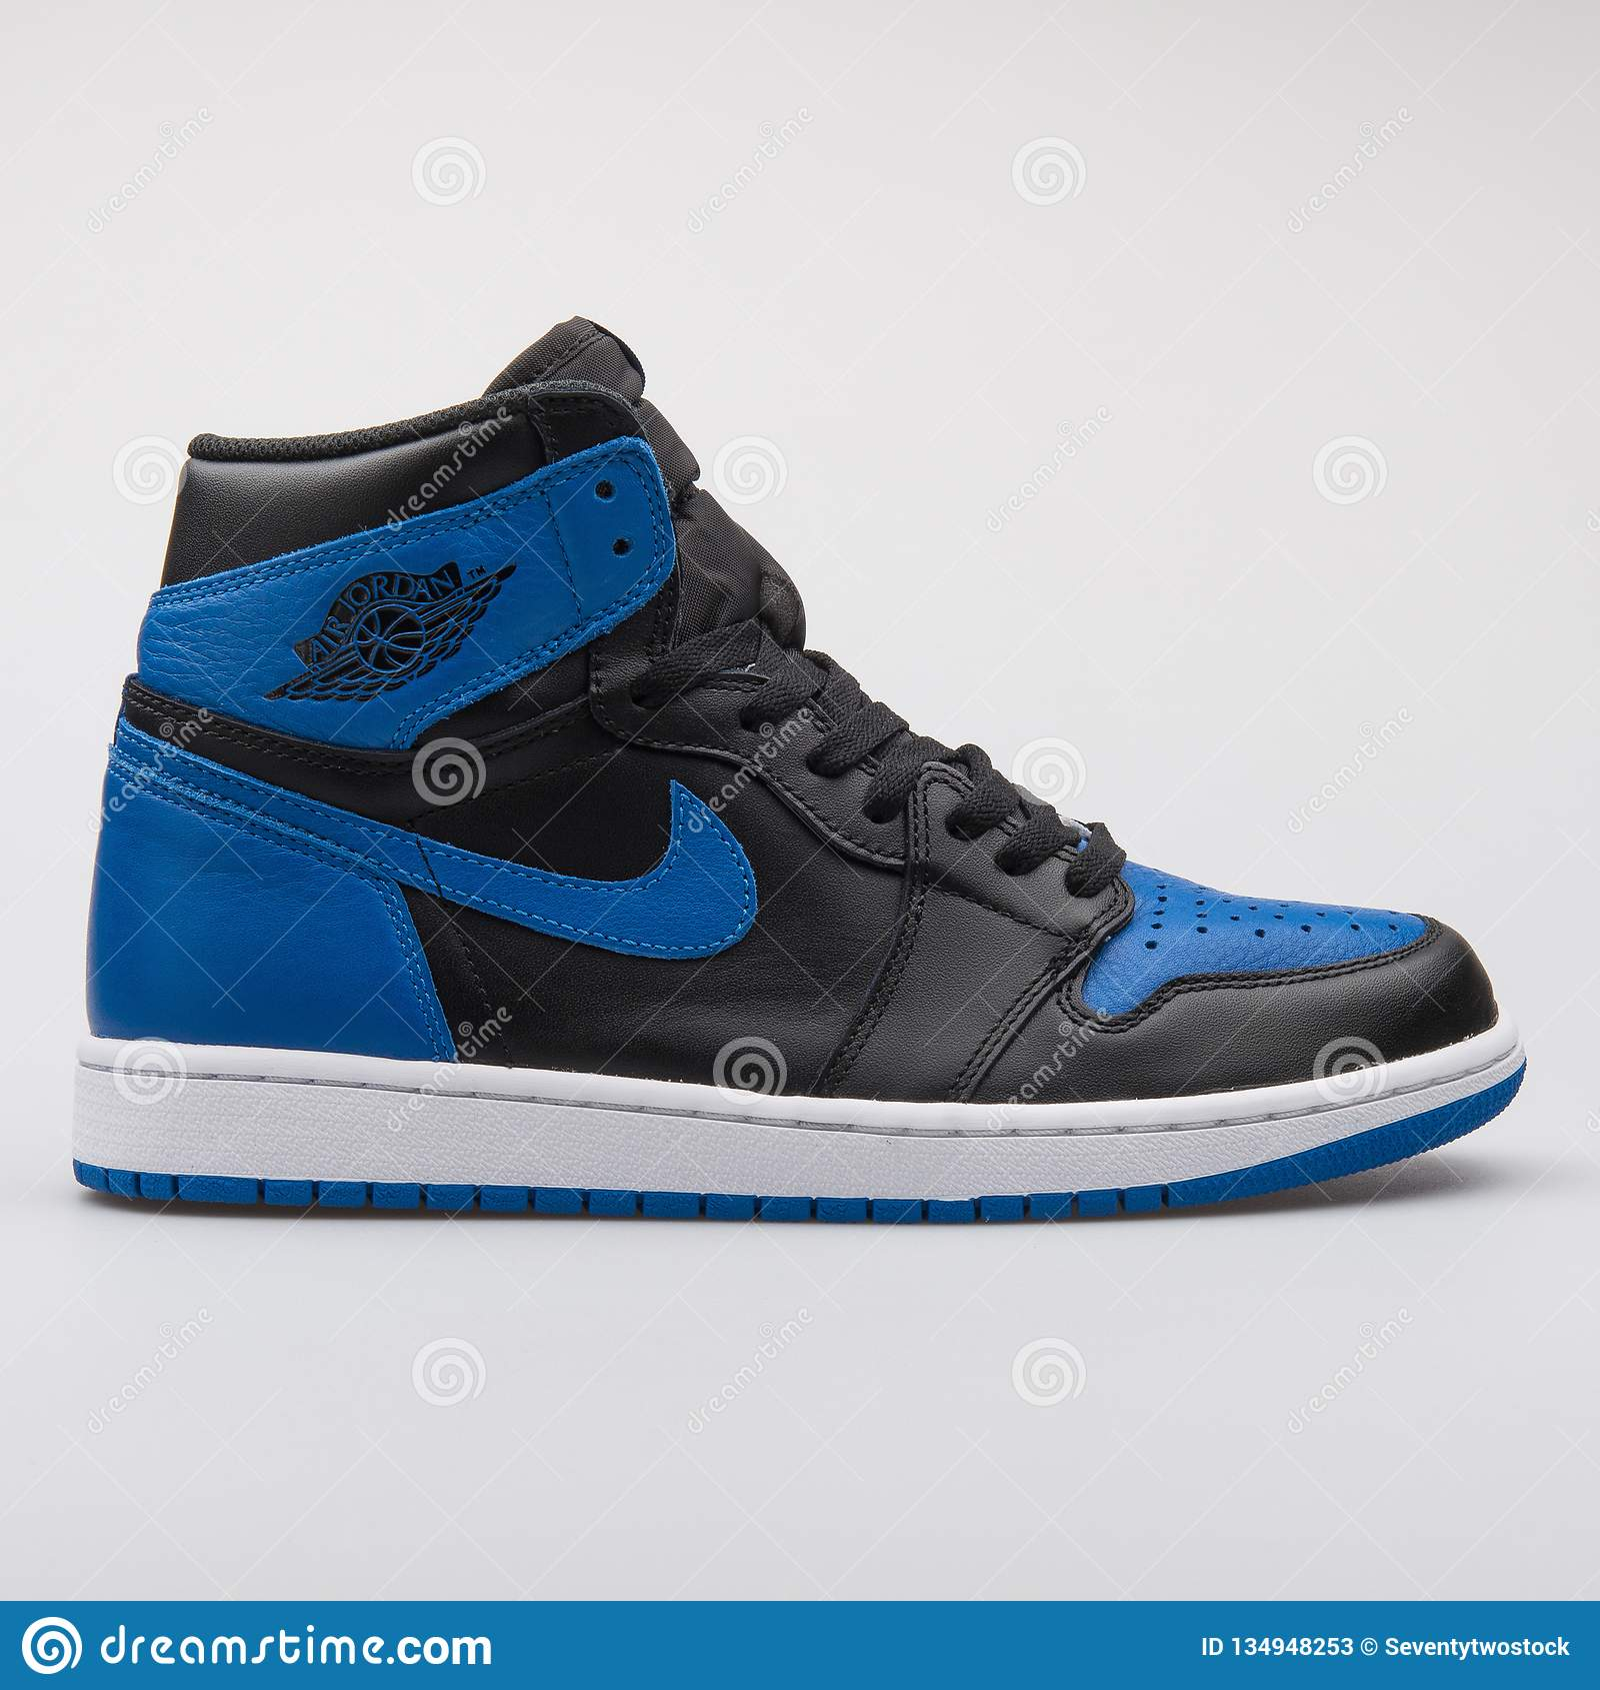 quality design d5f25 49712 VIENNA, AUSTRIA - JUNE 14, 2017  Nike Air Jordan 1 Retro High OG black and  blue sneaker isolated on grey background